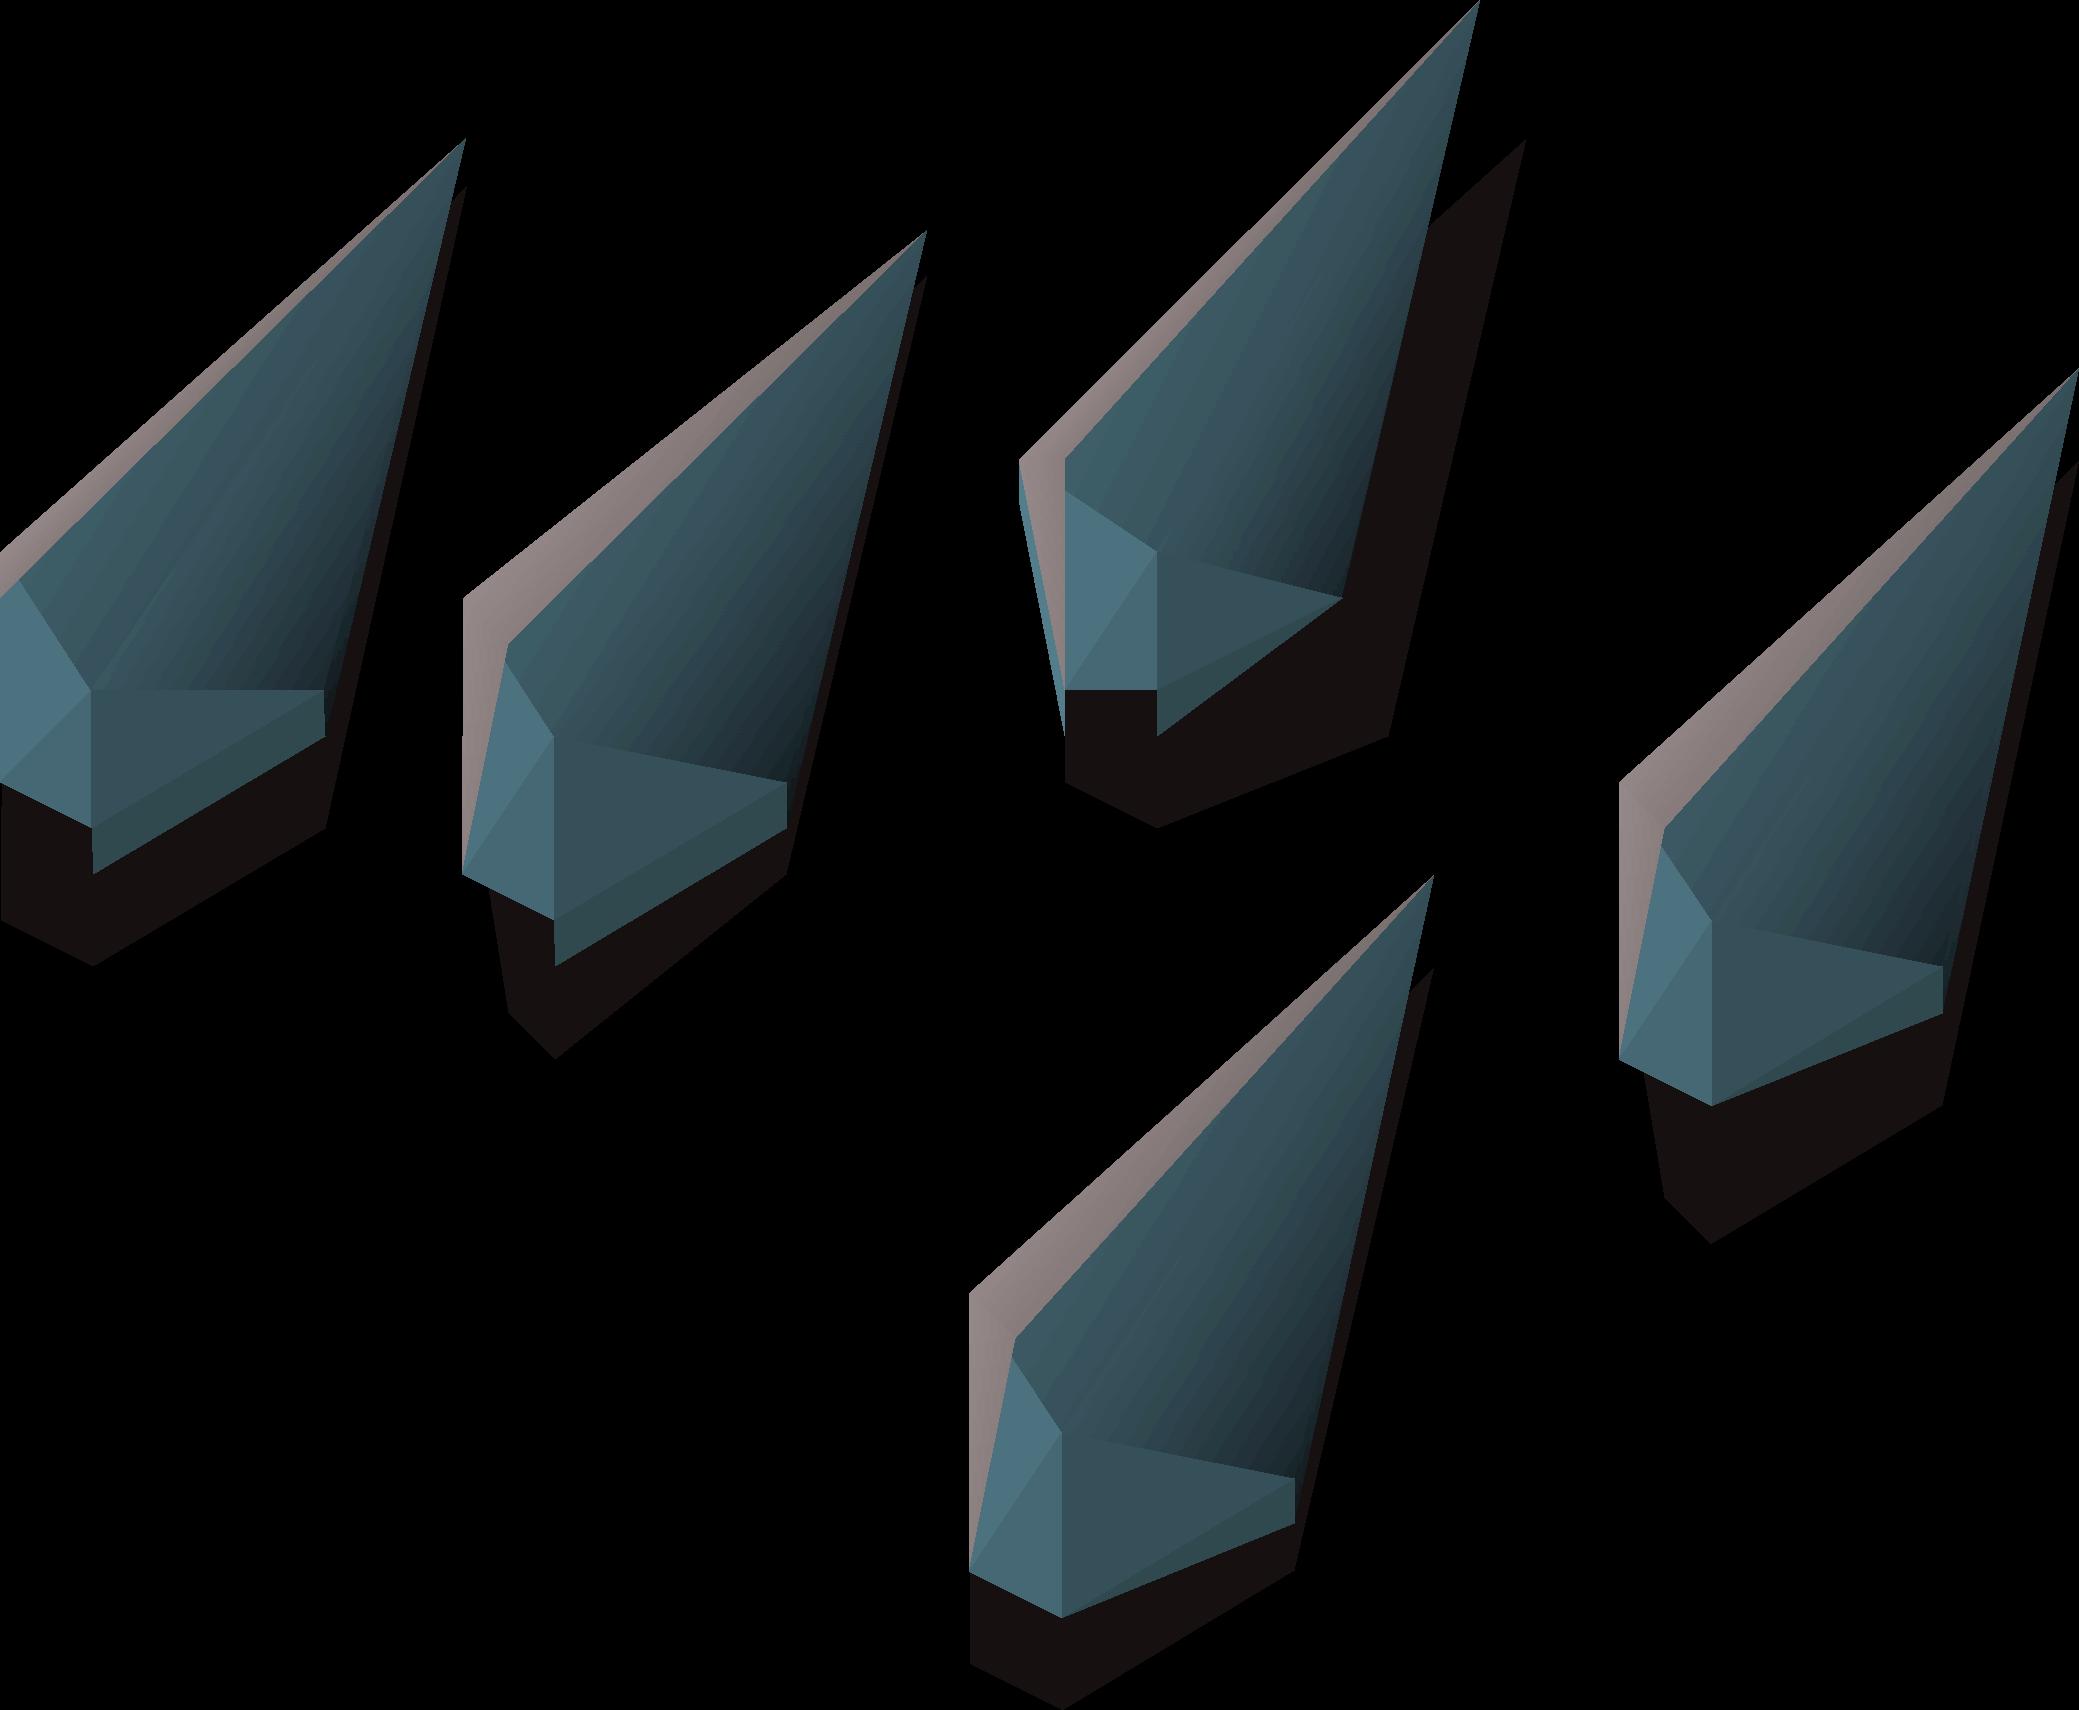 Rune arrowtips